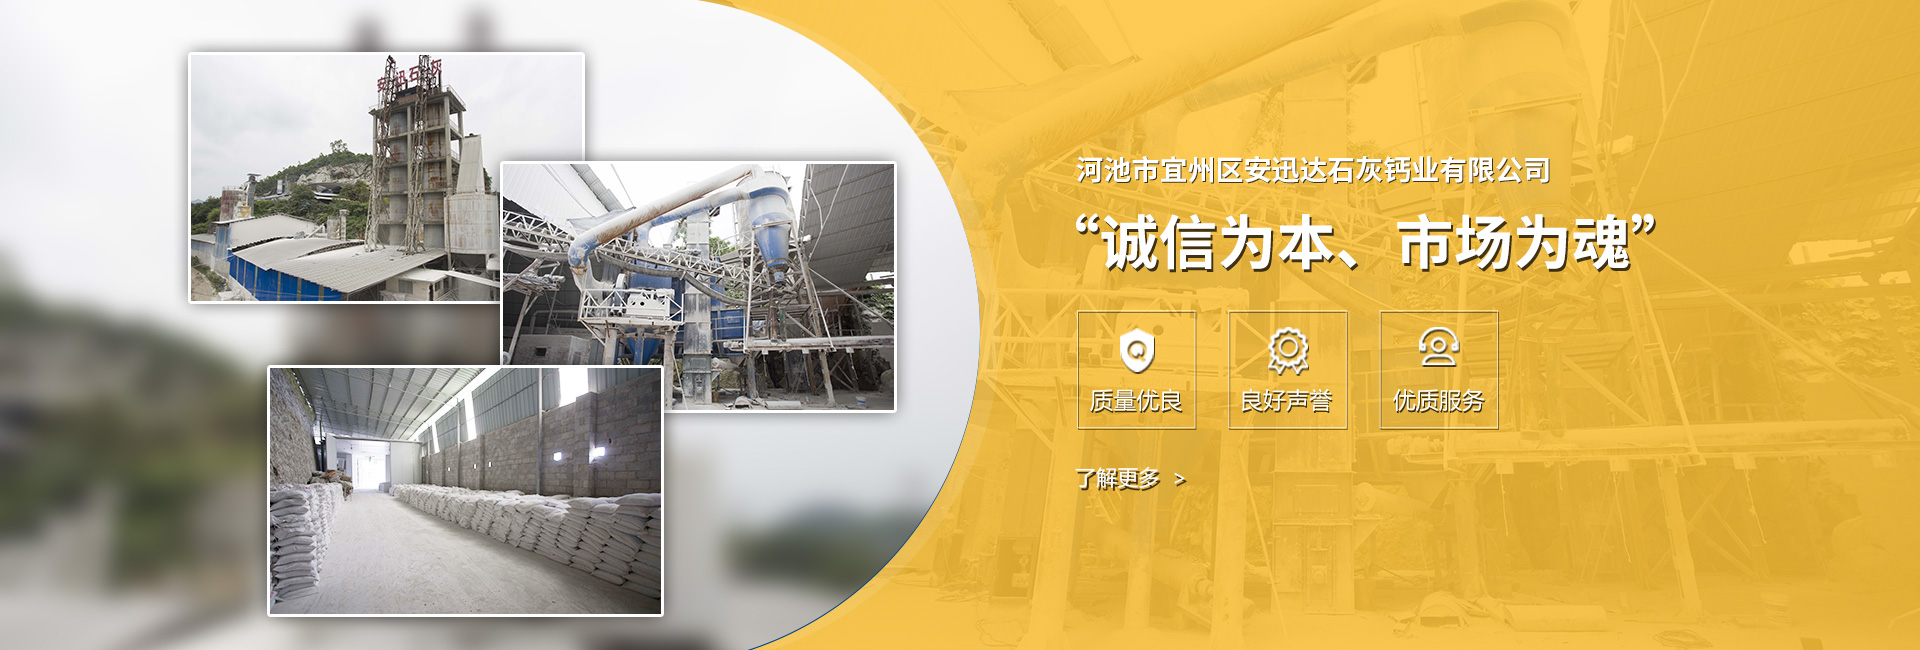 http://www.anxunshihui.com/data/images/slide/20210622104420_250.jpg